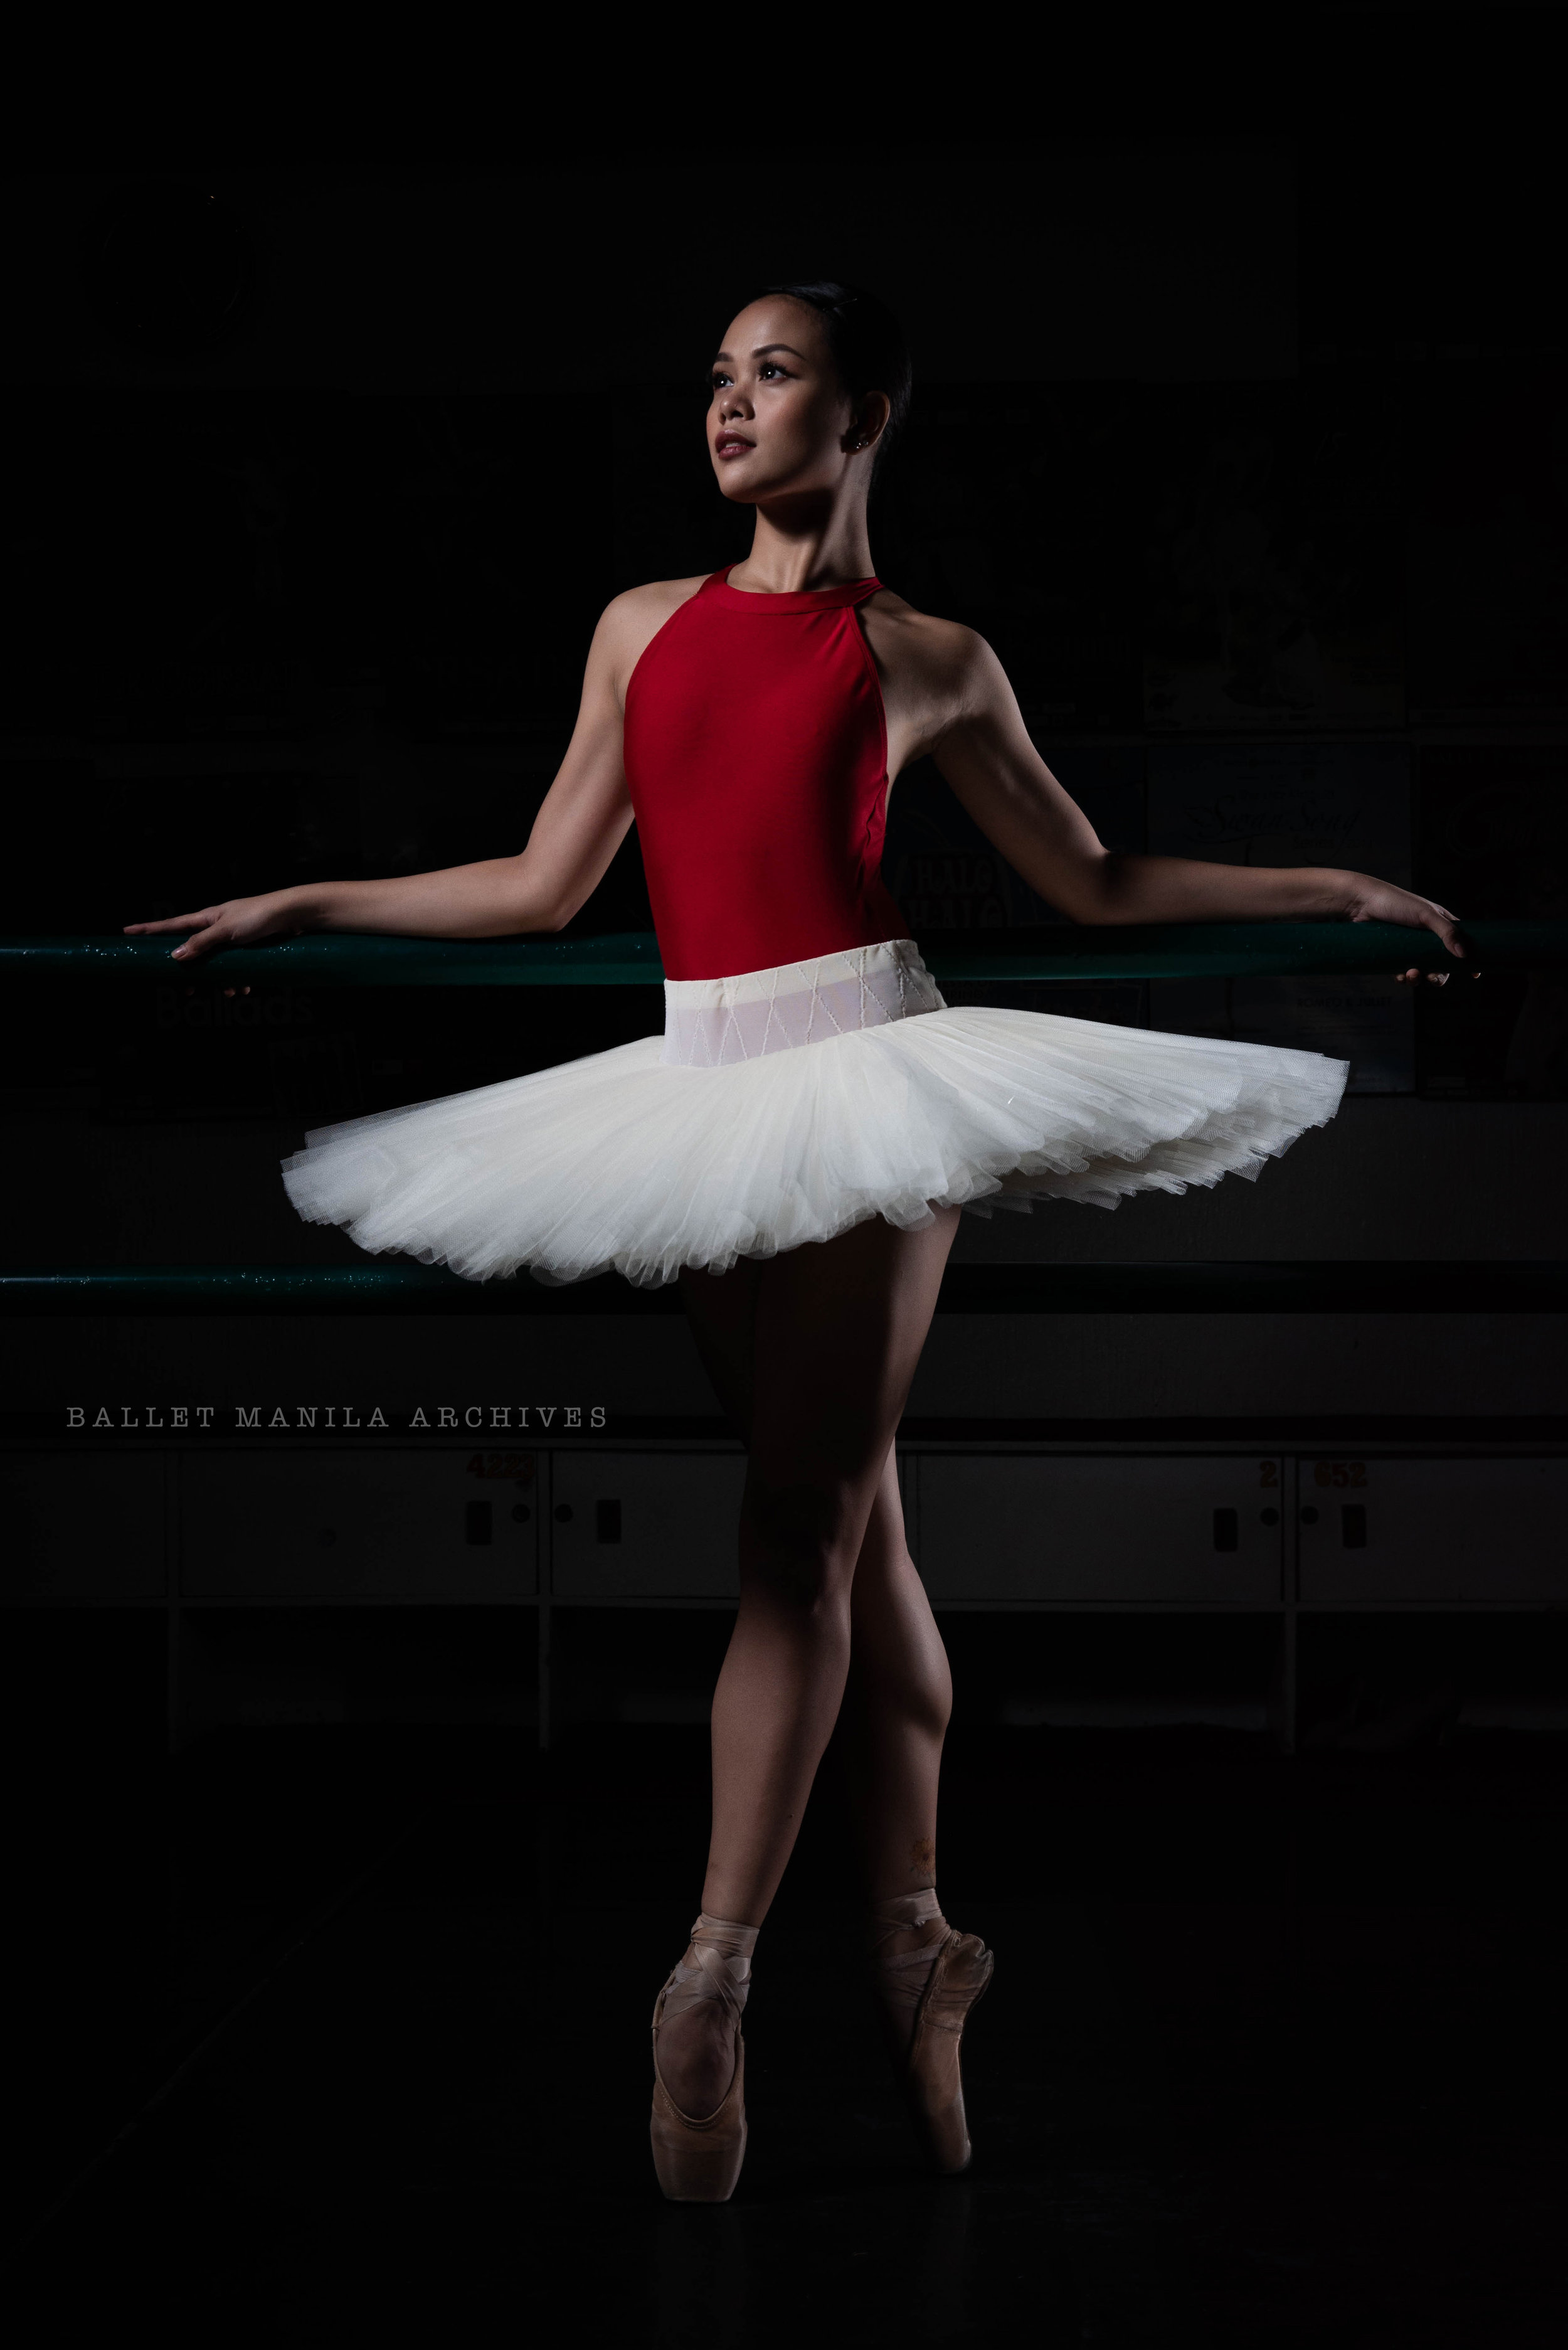 Ballet Dictionary: Practice Tutu 1 - Ballet Manila Archives